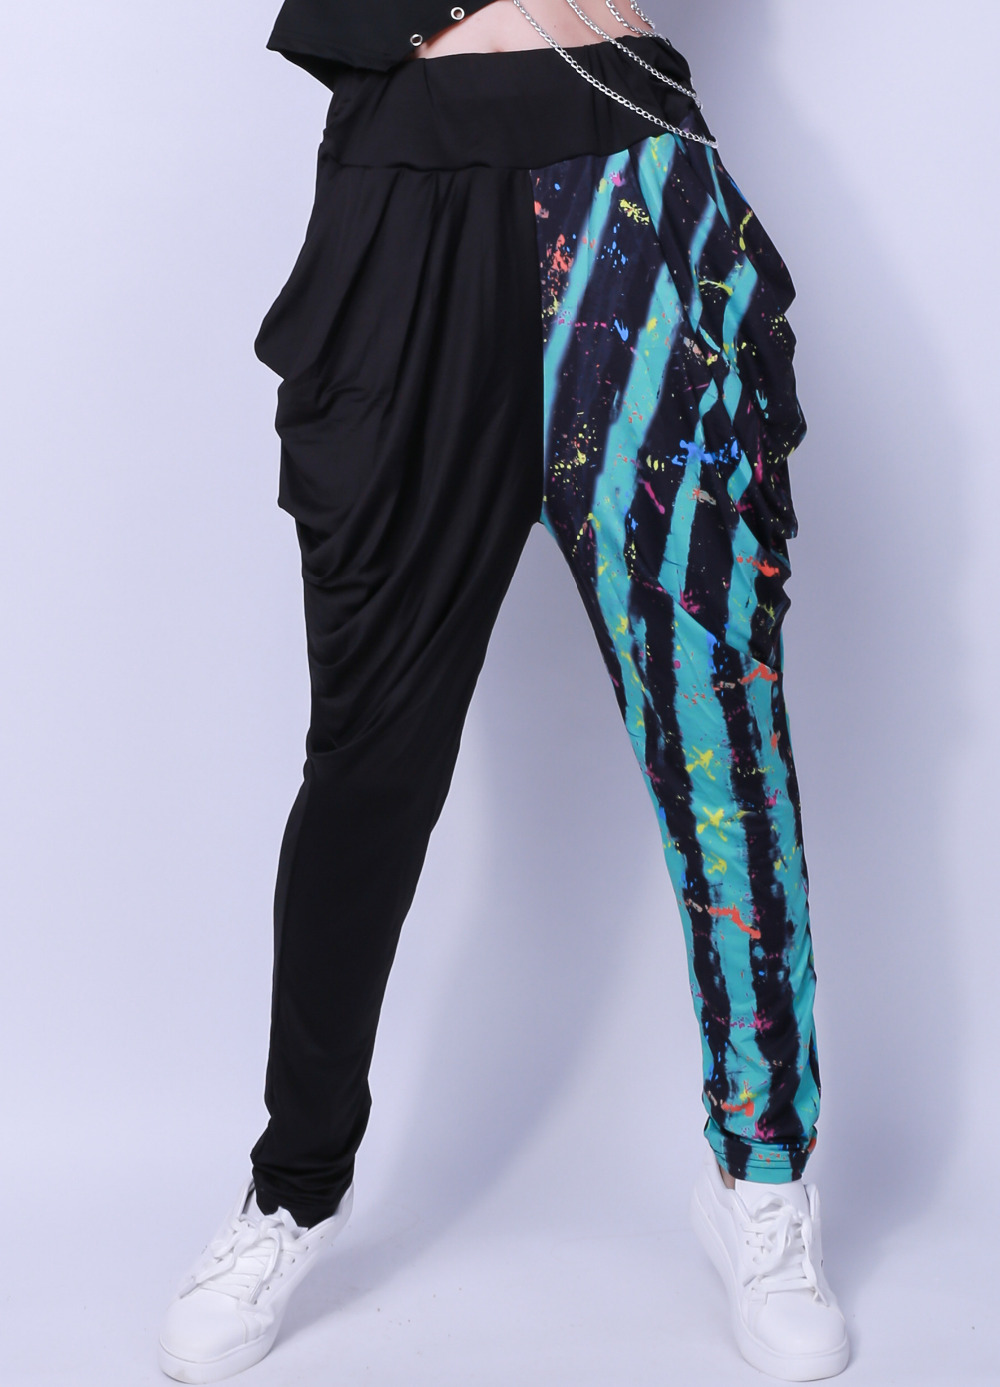 Kids Adult Spring jazz Skinny pencil Sweatpant Costume wear Exclusive Black Camouflage Strip Patchwork harem Hip Hop Dance Pants